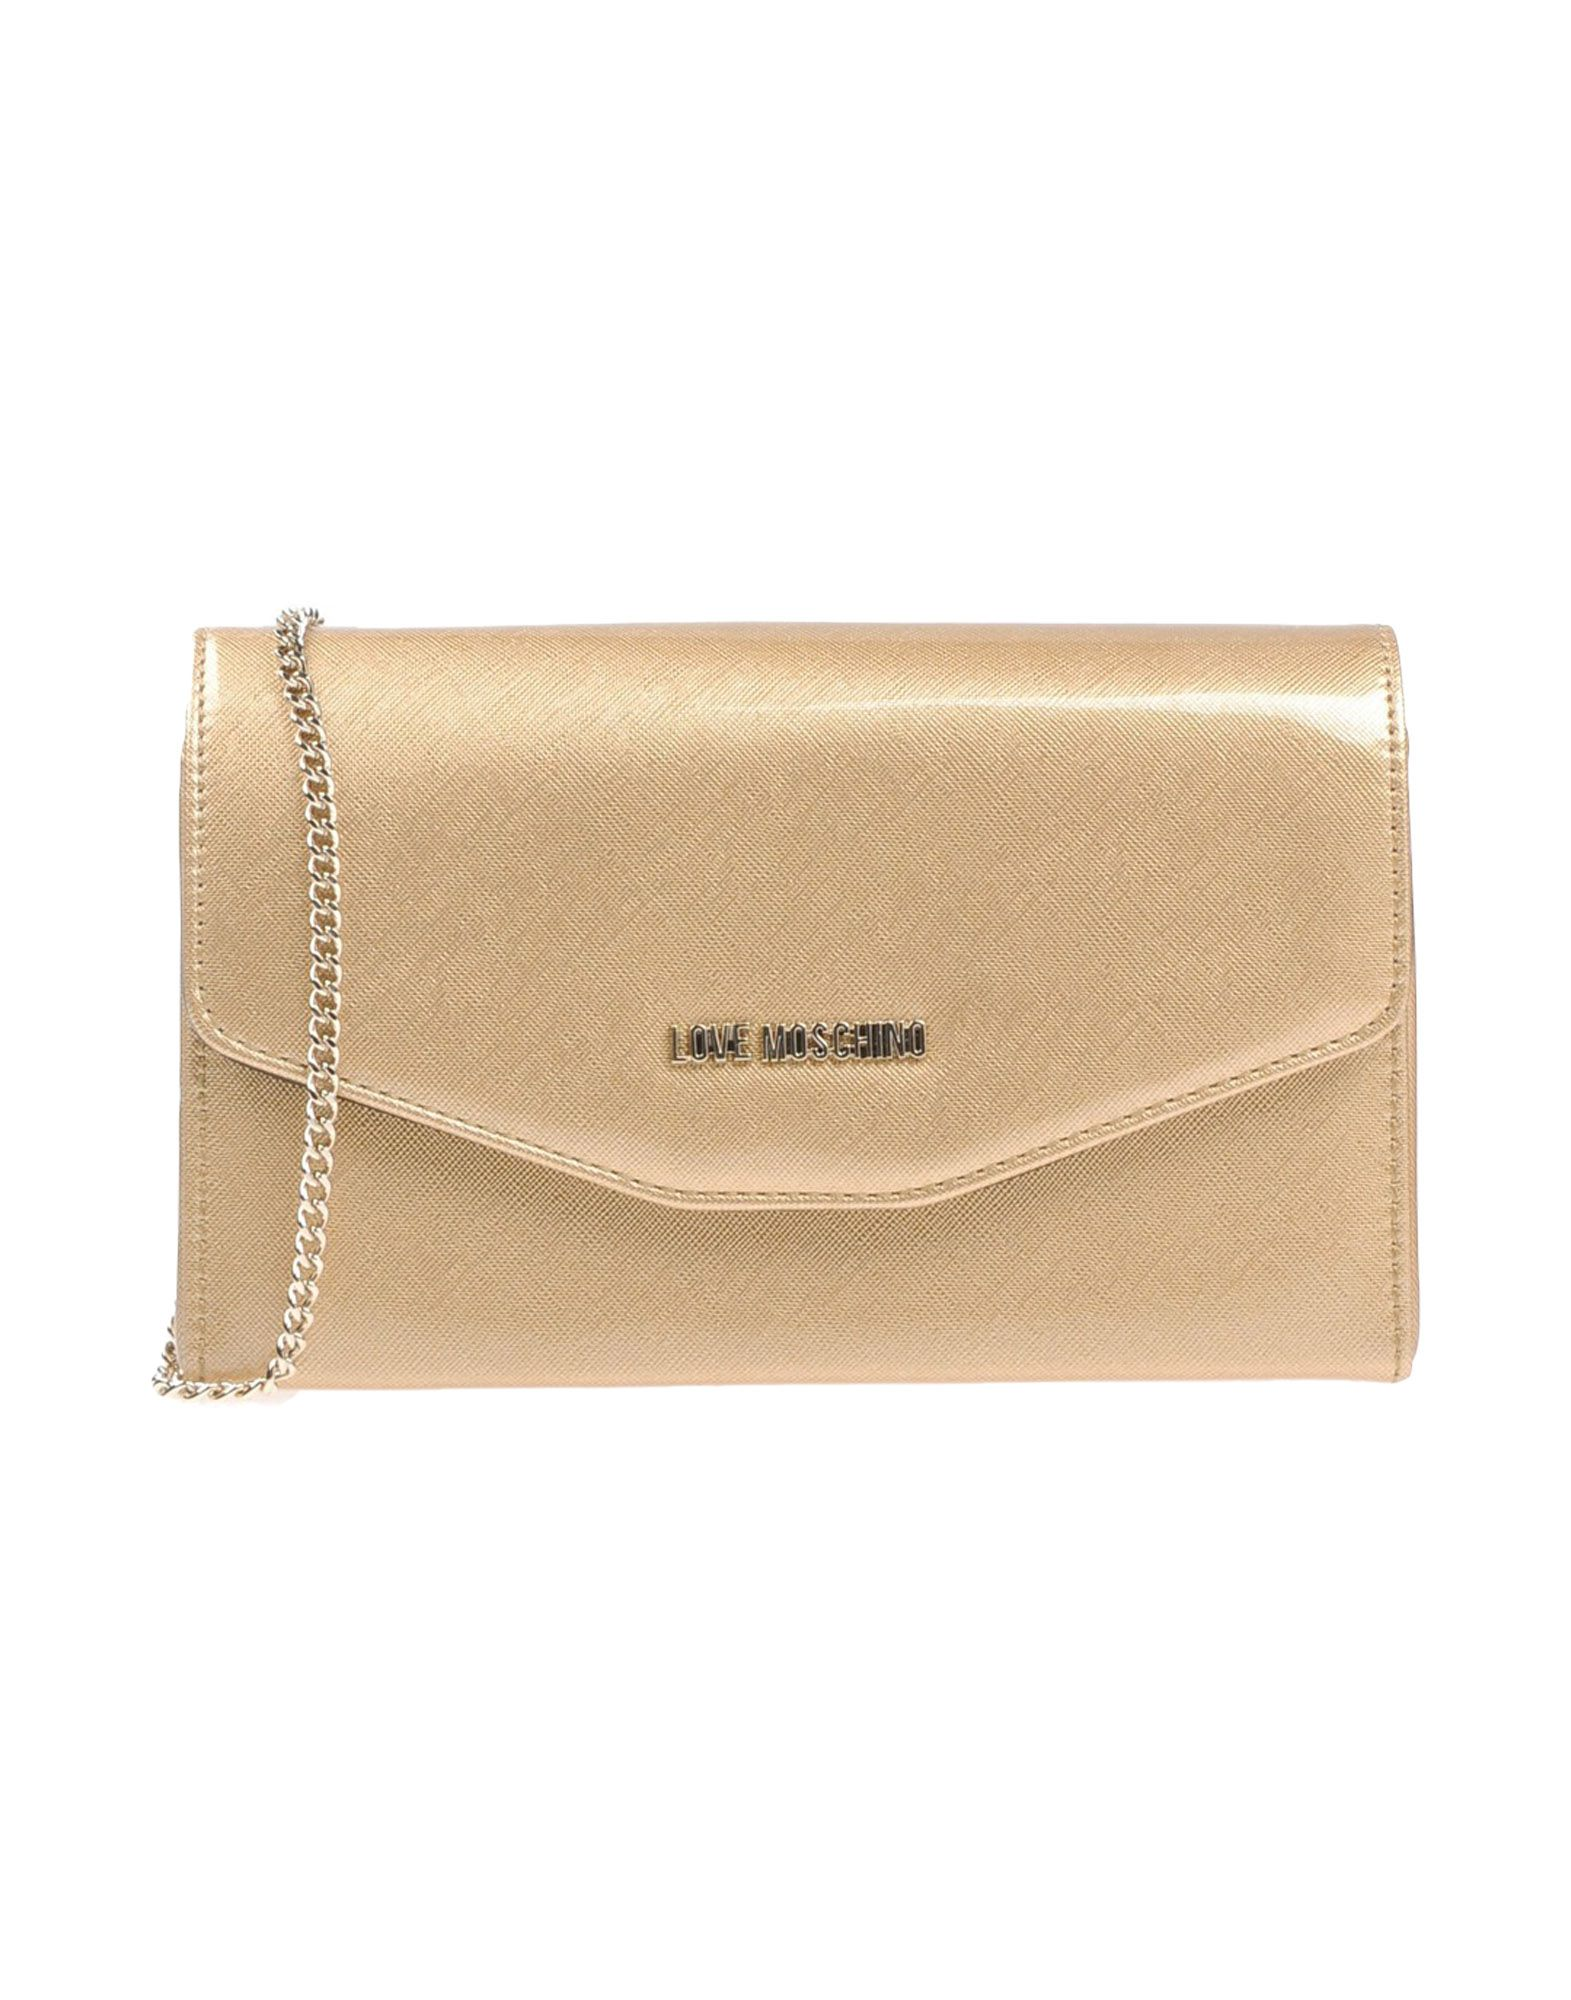 LOVE MOSCHINO Сумка через плечо сумка moschino love коричневый